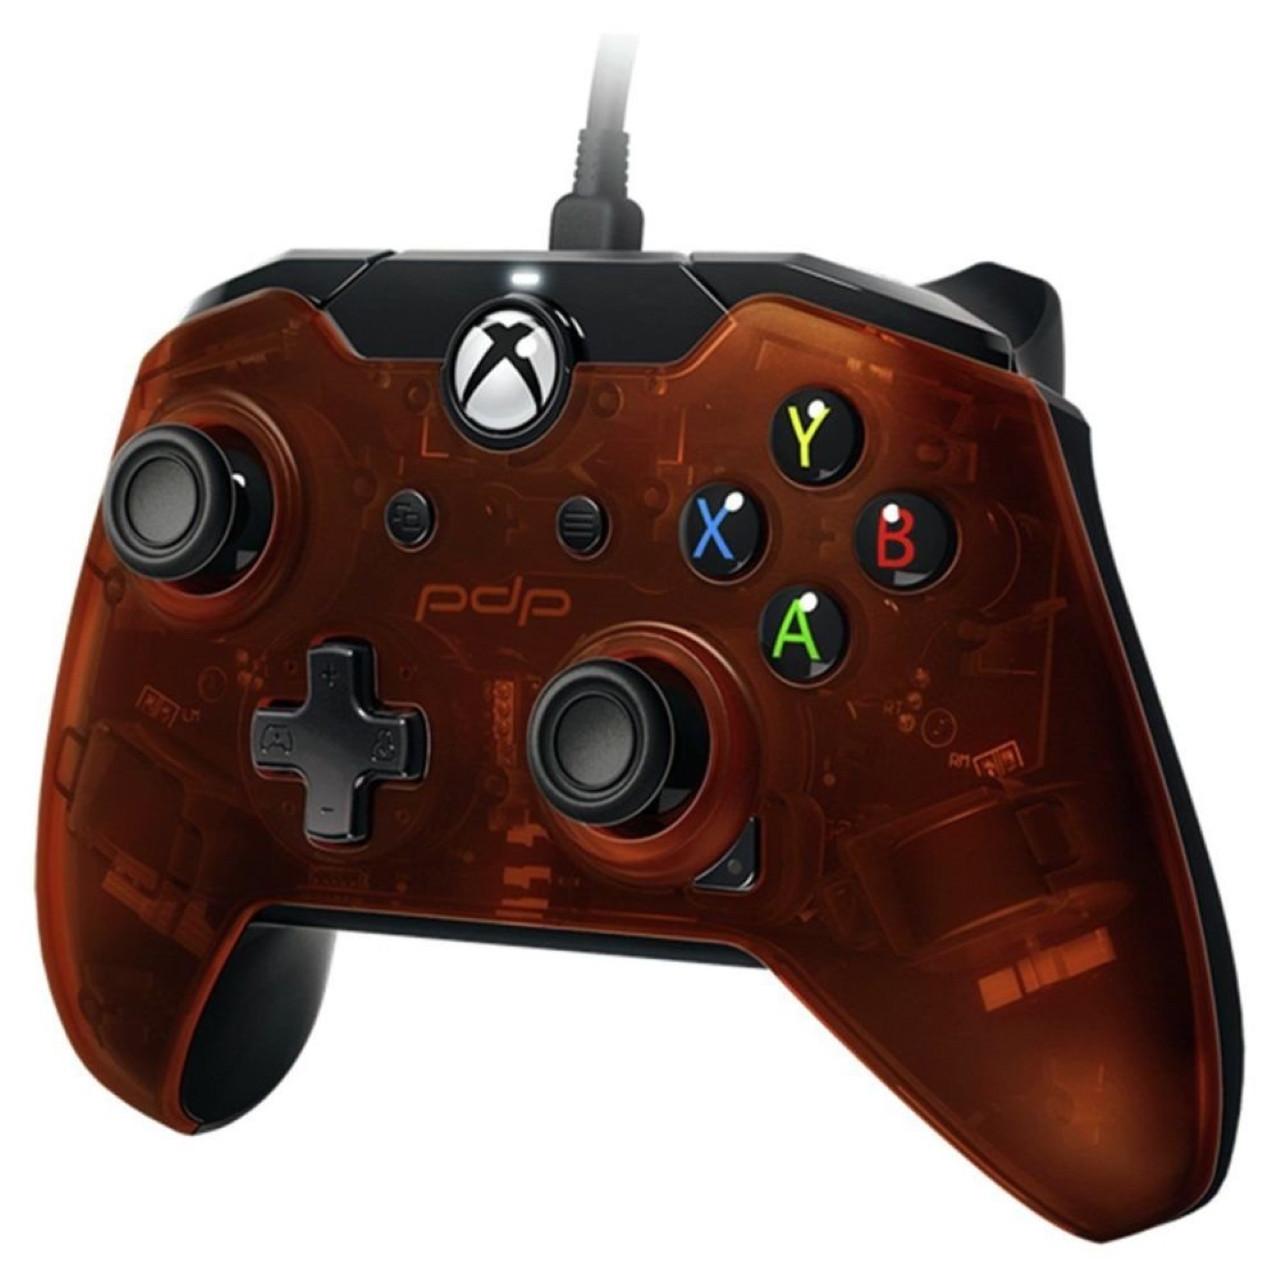 Microsoft Xbox ONE,PC Wired Controller PDP XO Orange (провідний)